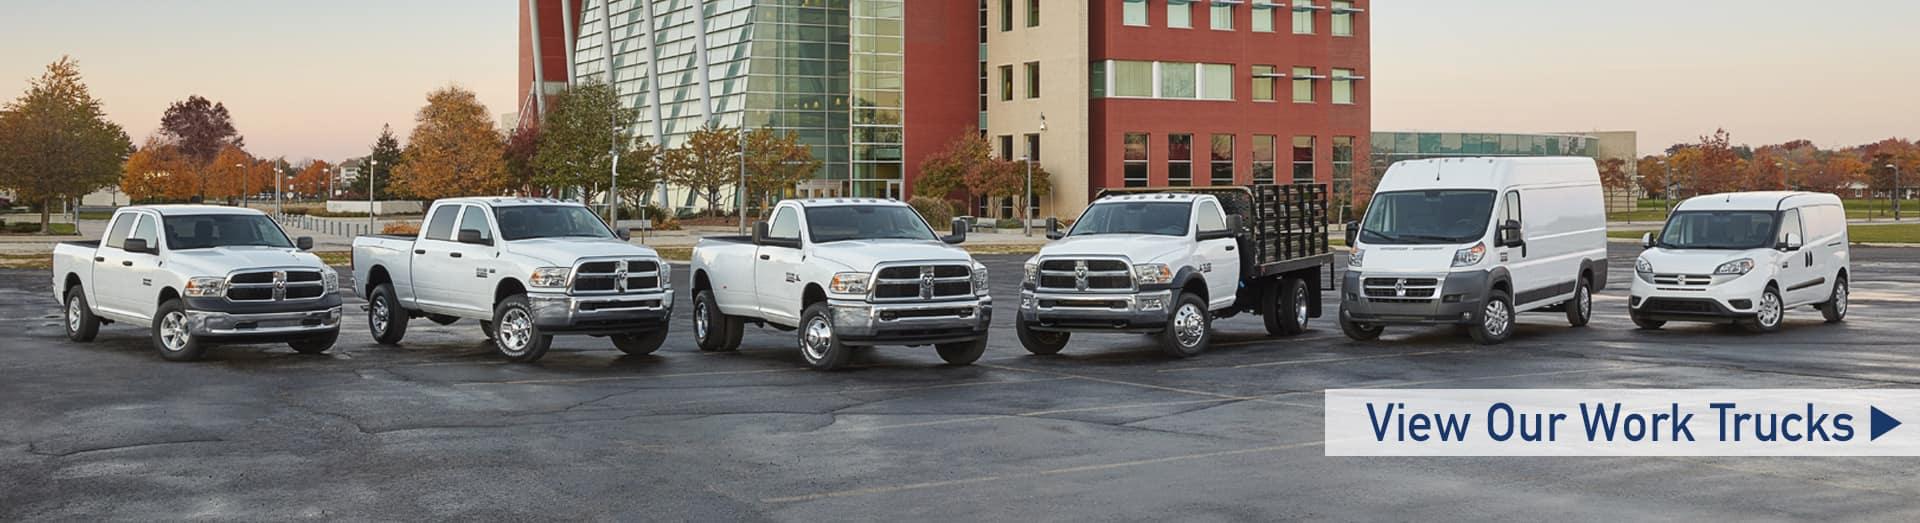 Mancaris Chrysler Dodge Jeep RAM Inc CDJR Dealer In Oak Lawn - Chrysler dealership phone number